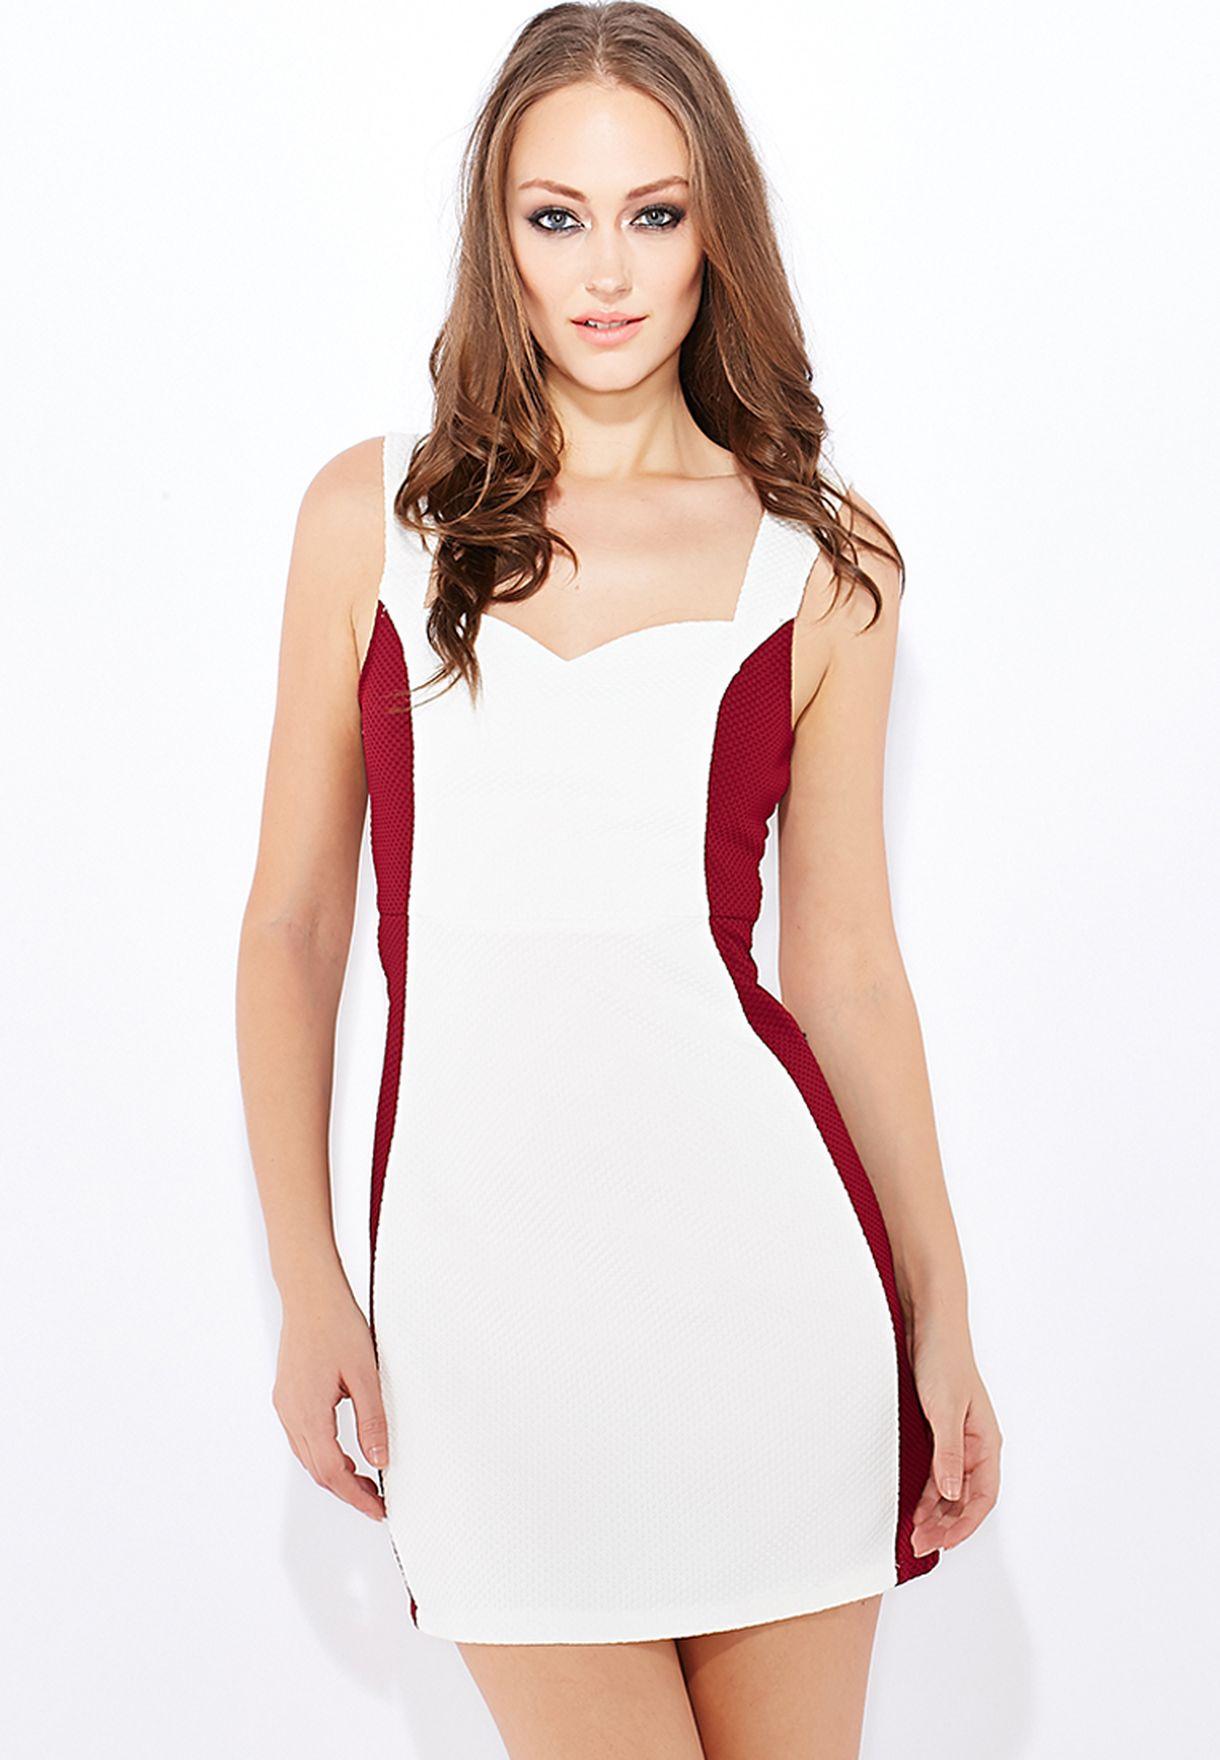 a5fb6d131 تسوق فستان قصير وضيق ماركة جينجر لون أبيض في السعودية - GI121AT97OVM